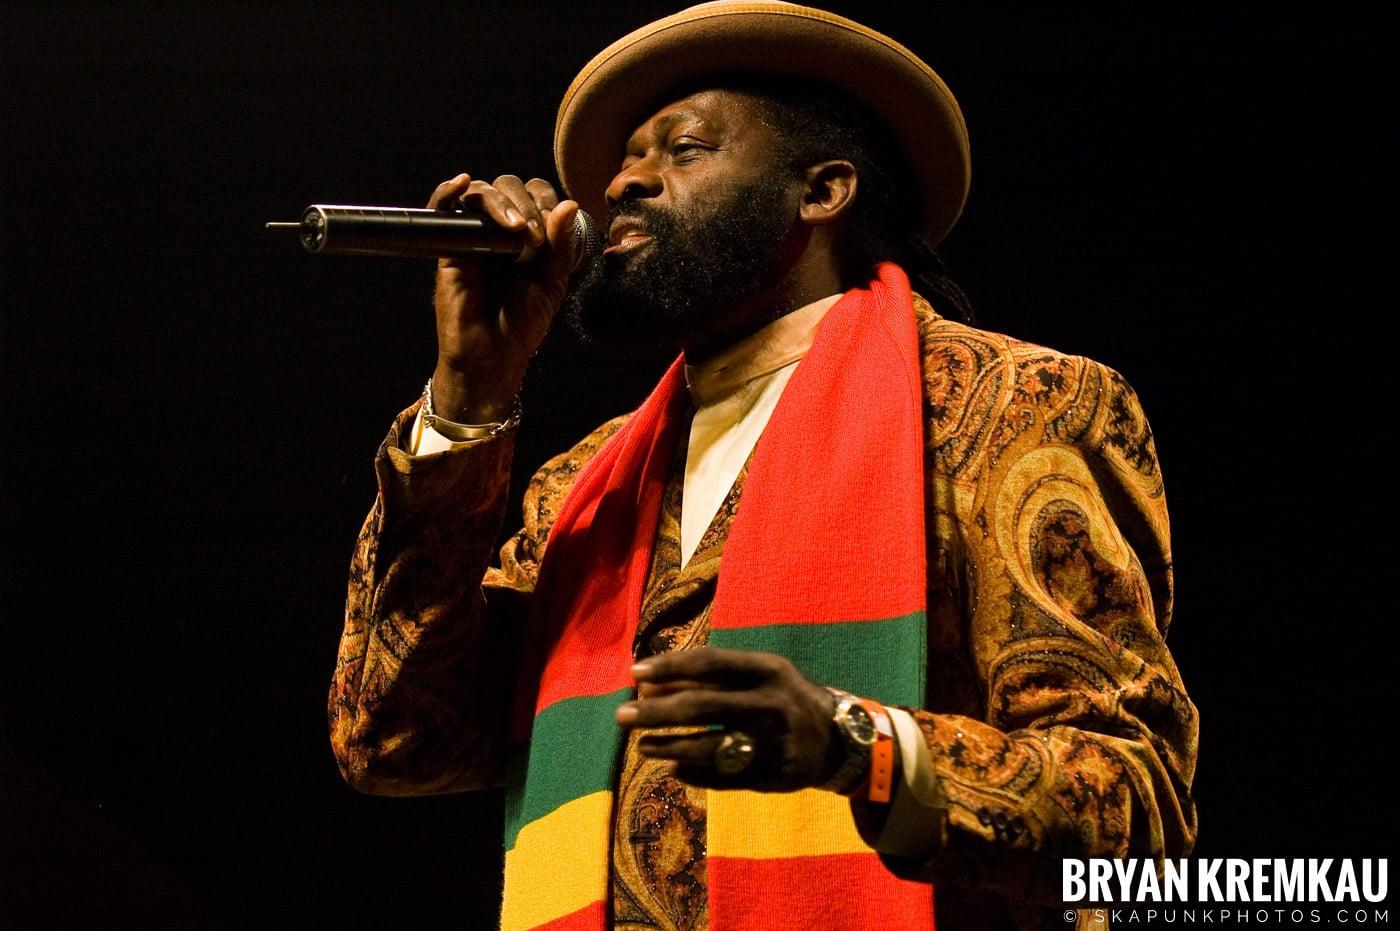 Jimmy Riley @ Vintage Reggae Fest - Hammerstein Ballroom, NYC - 12.16.07 (5)